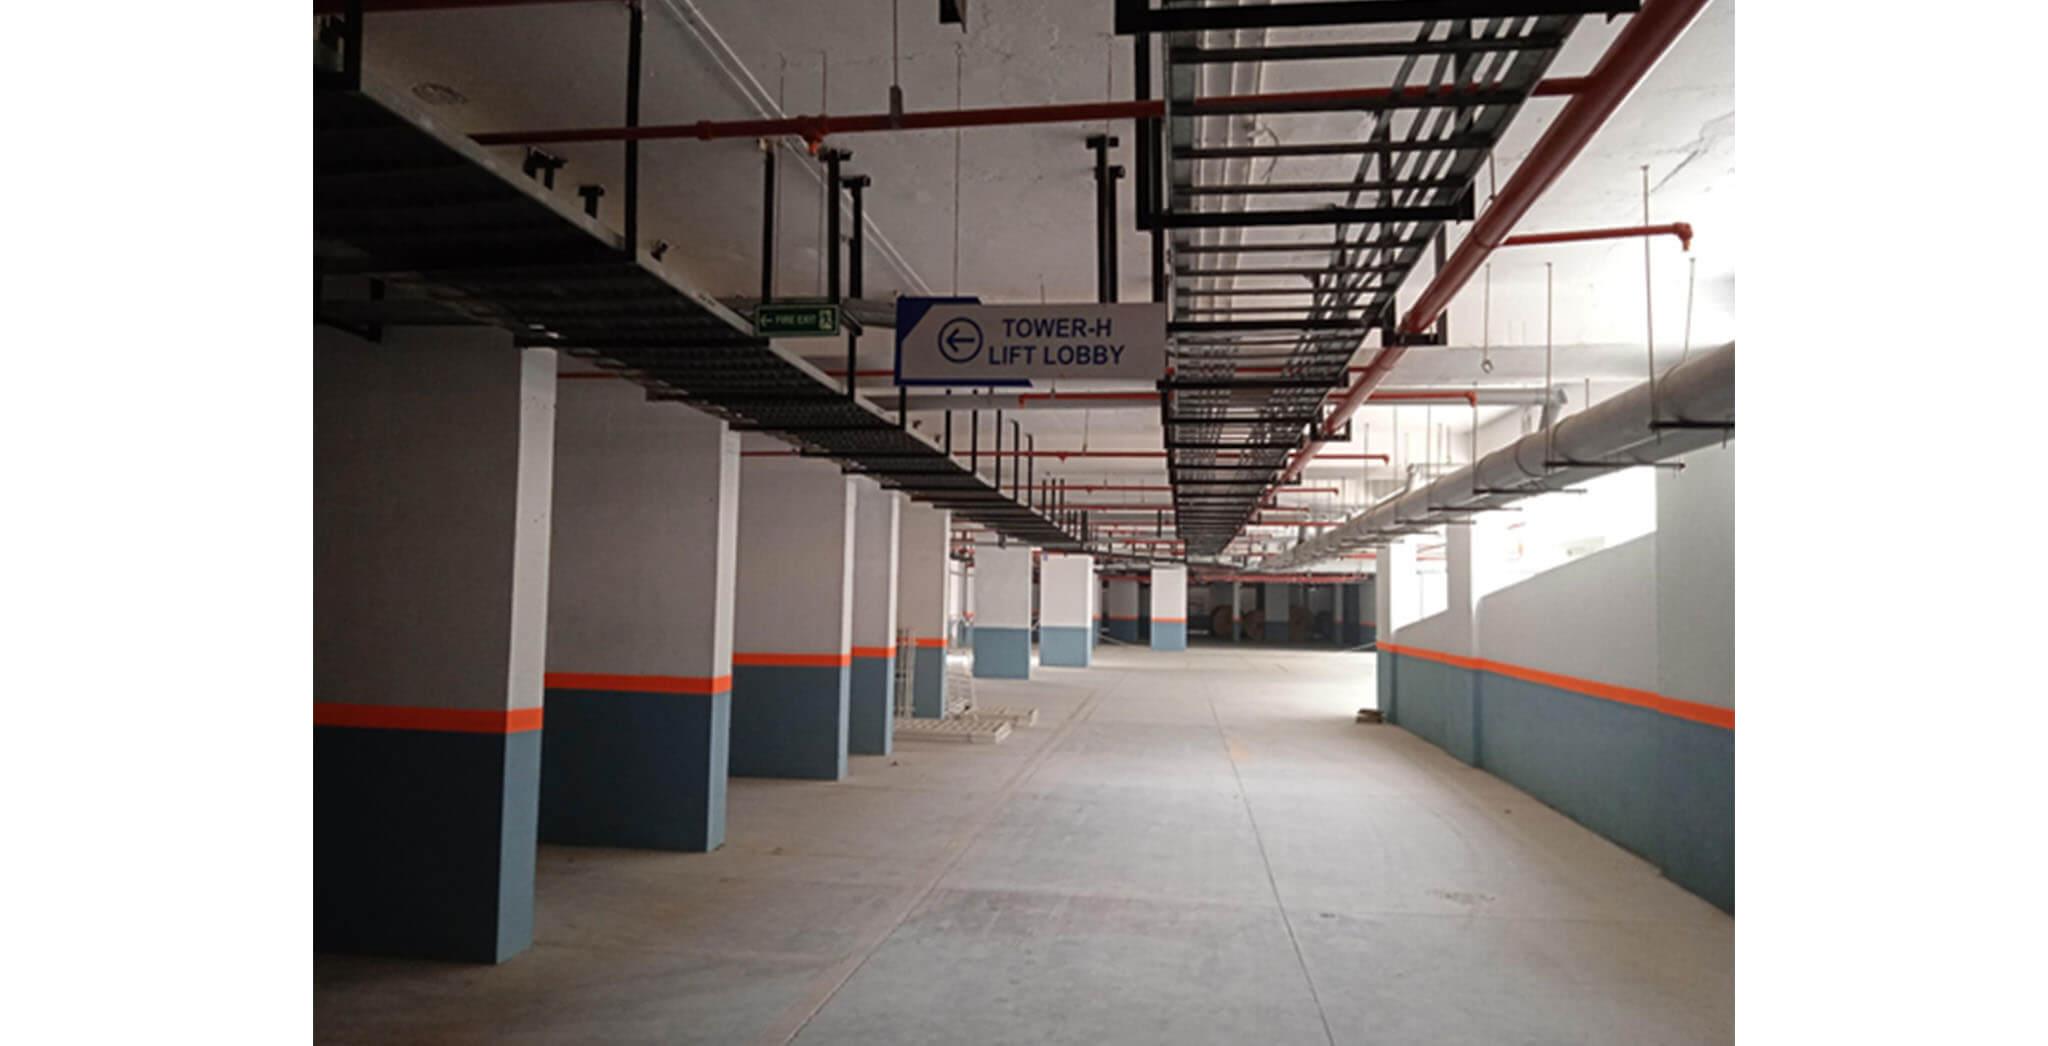 Dec 2020 - Basement and Car parking